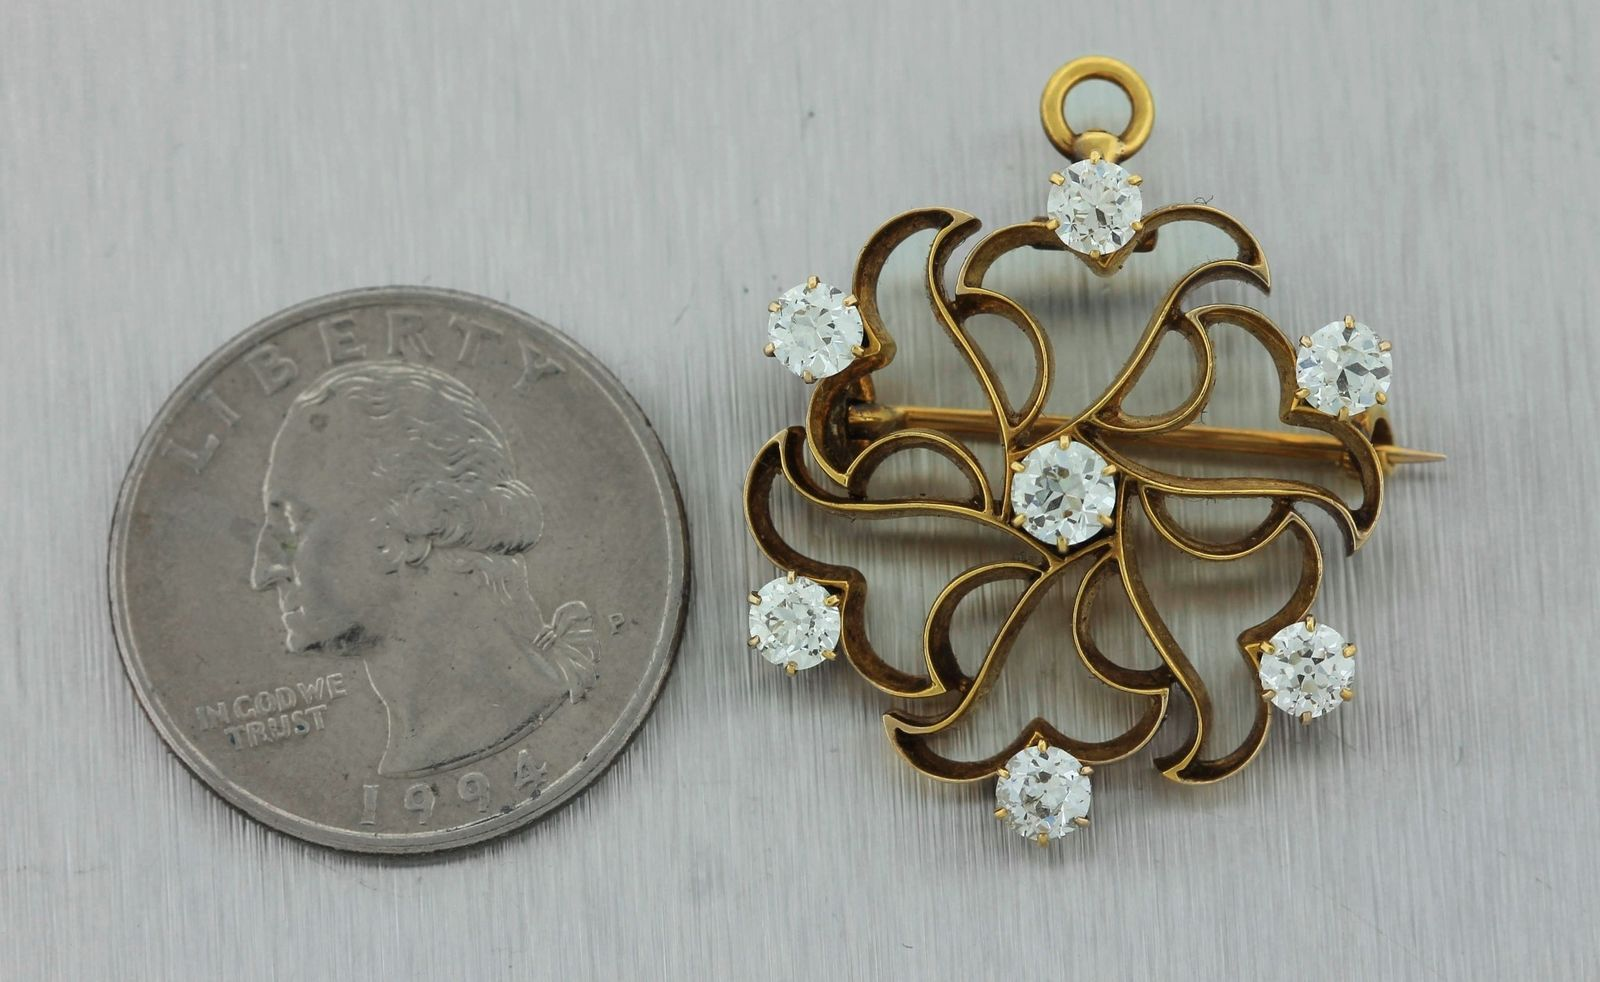 Vintage Tiffany & Co. 14K Yellow Gold 1.40ctw Diamond Floral Pendant Pin Brooch